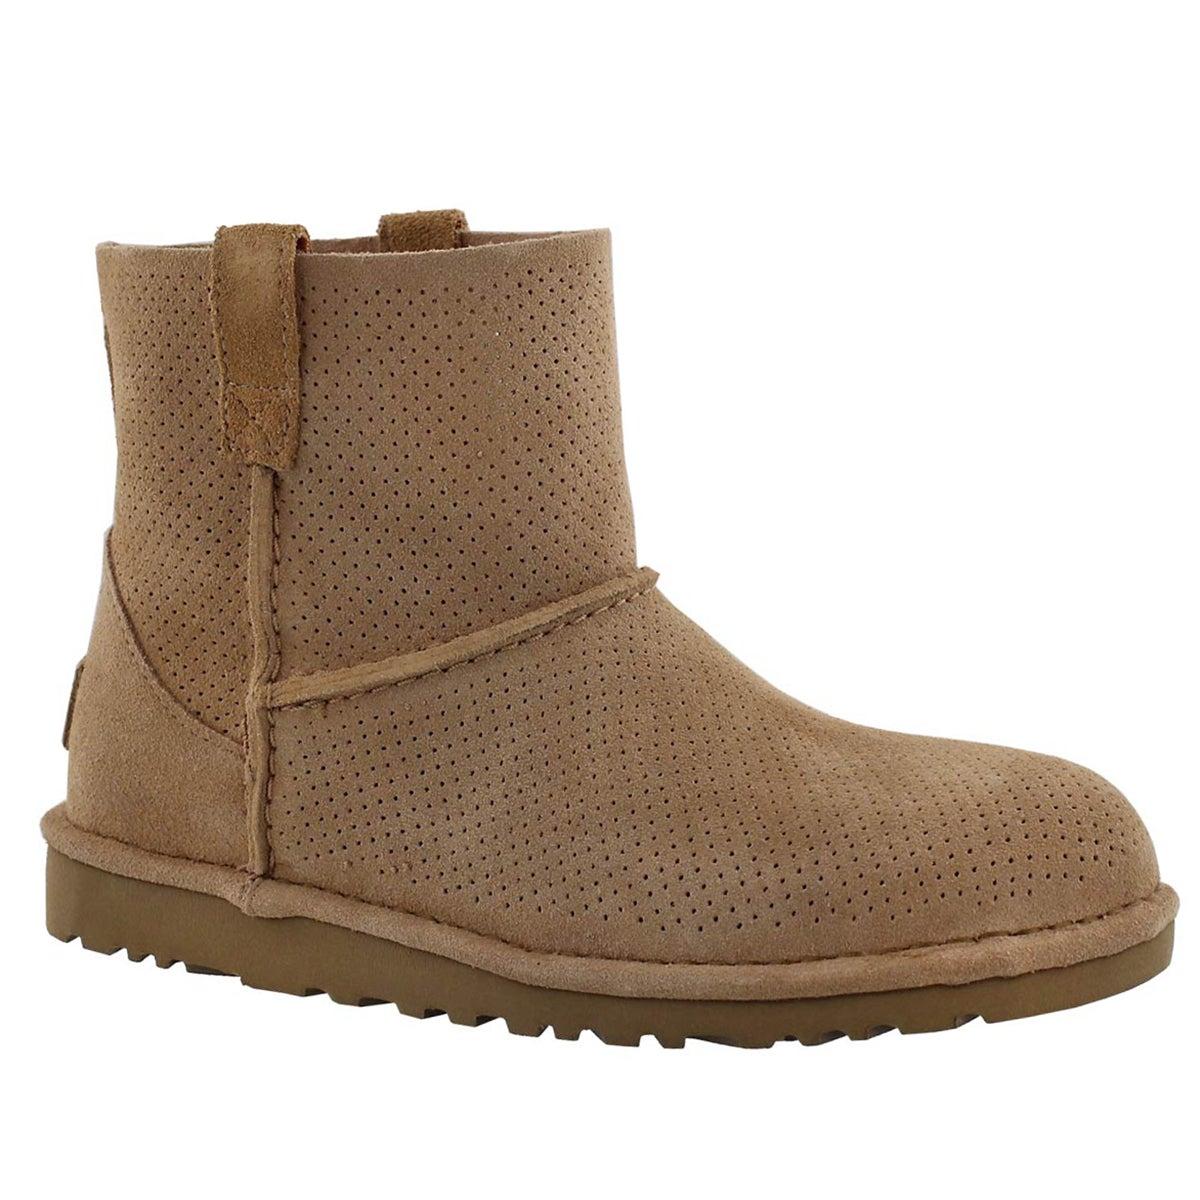 Lds Classic Unlined Mini Perf tawny boot